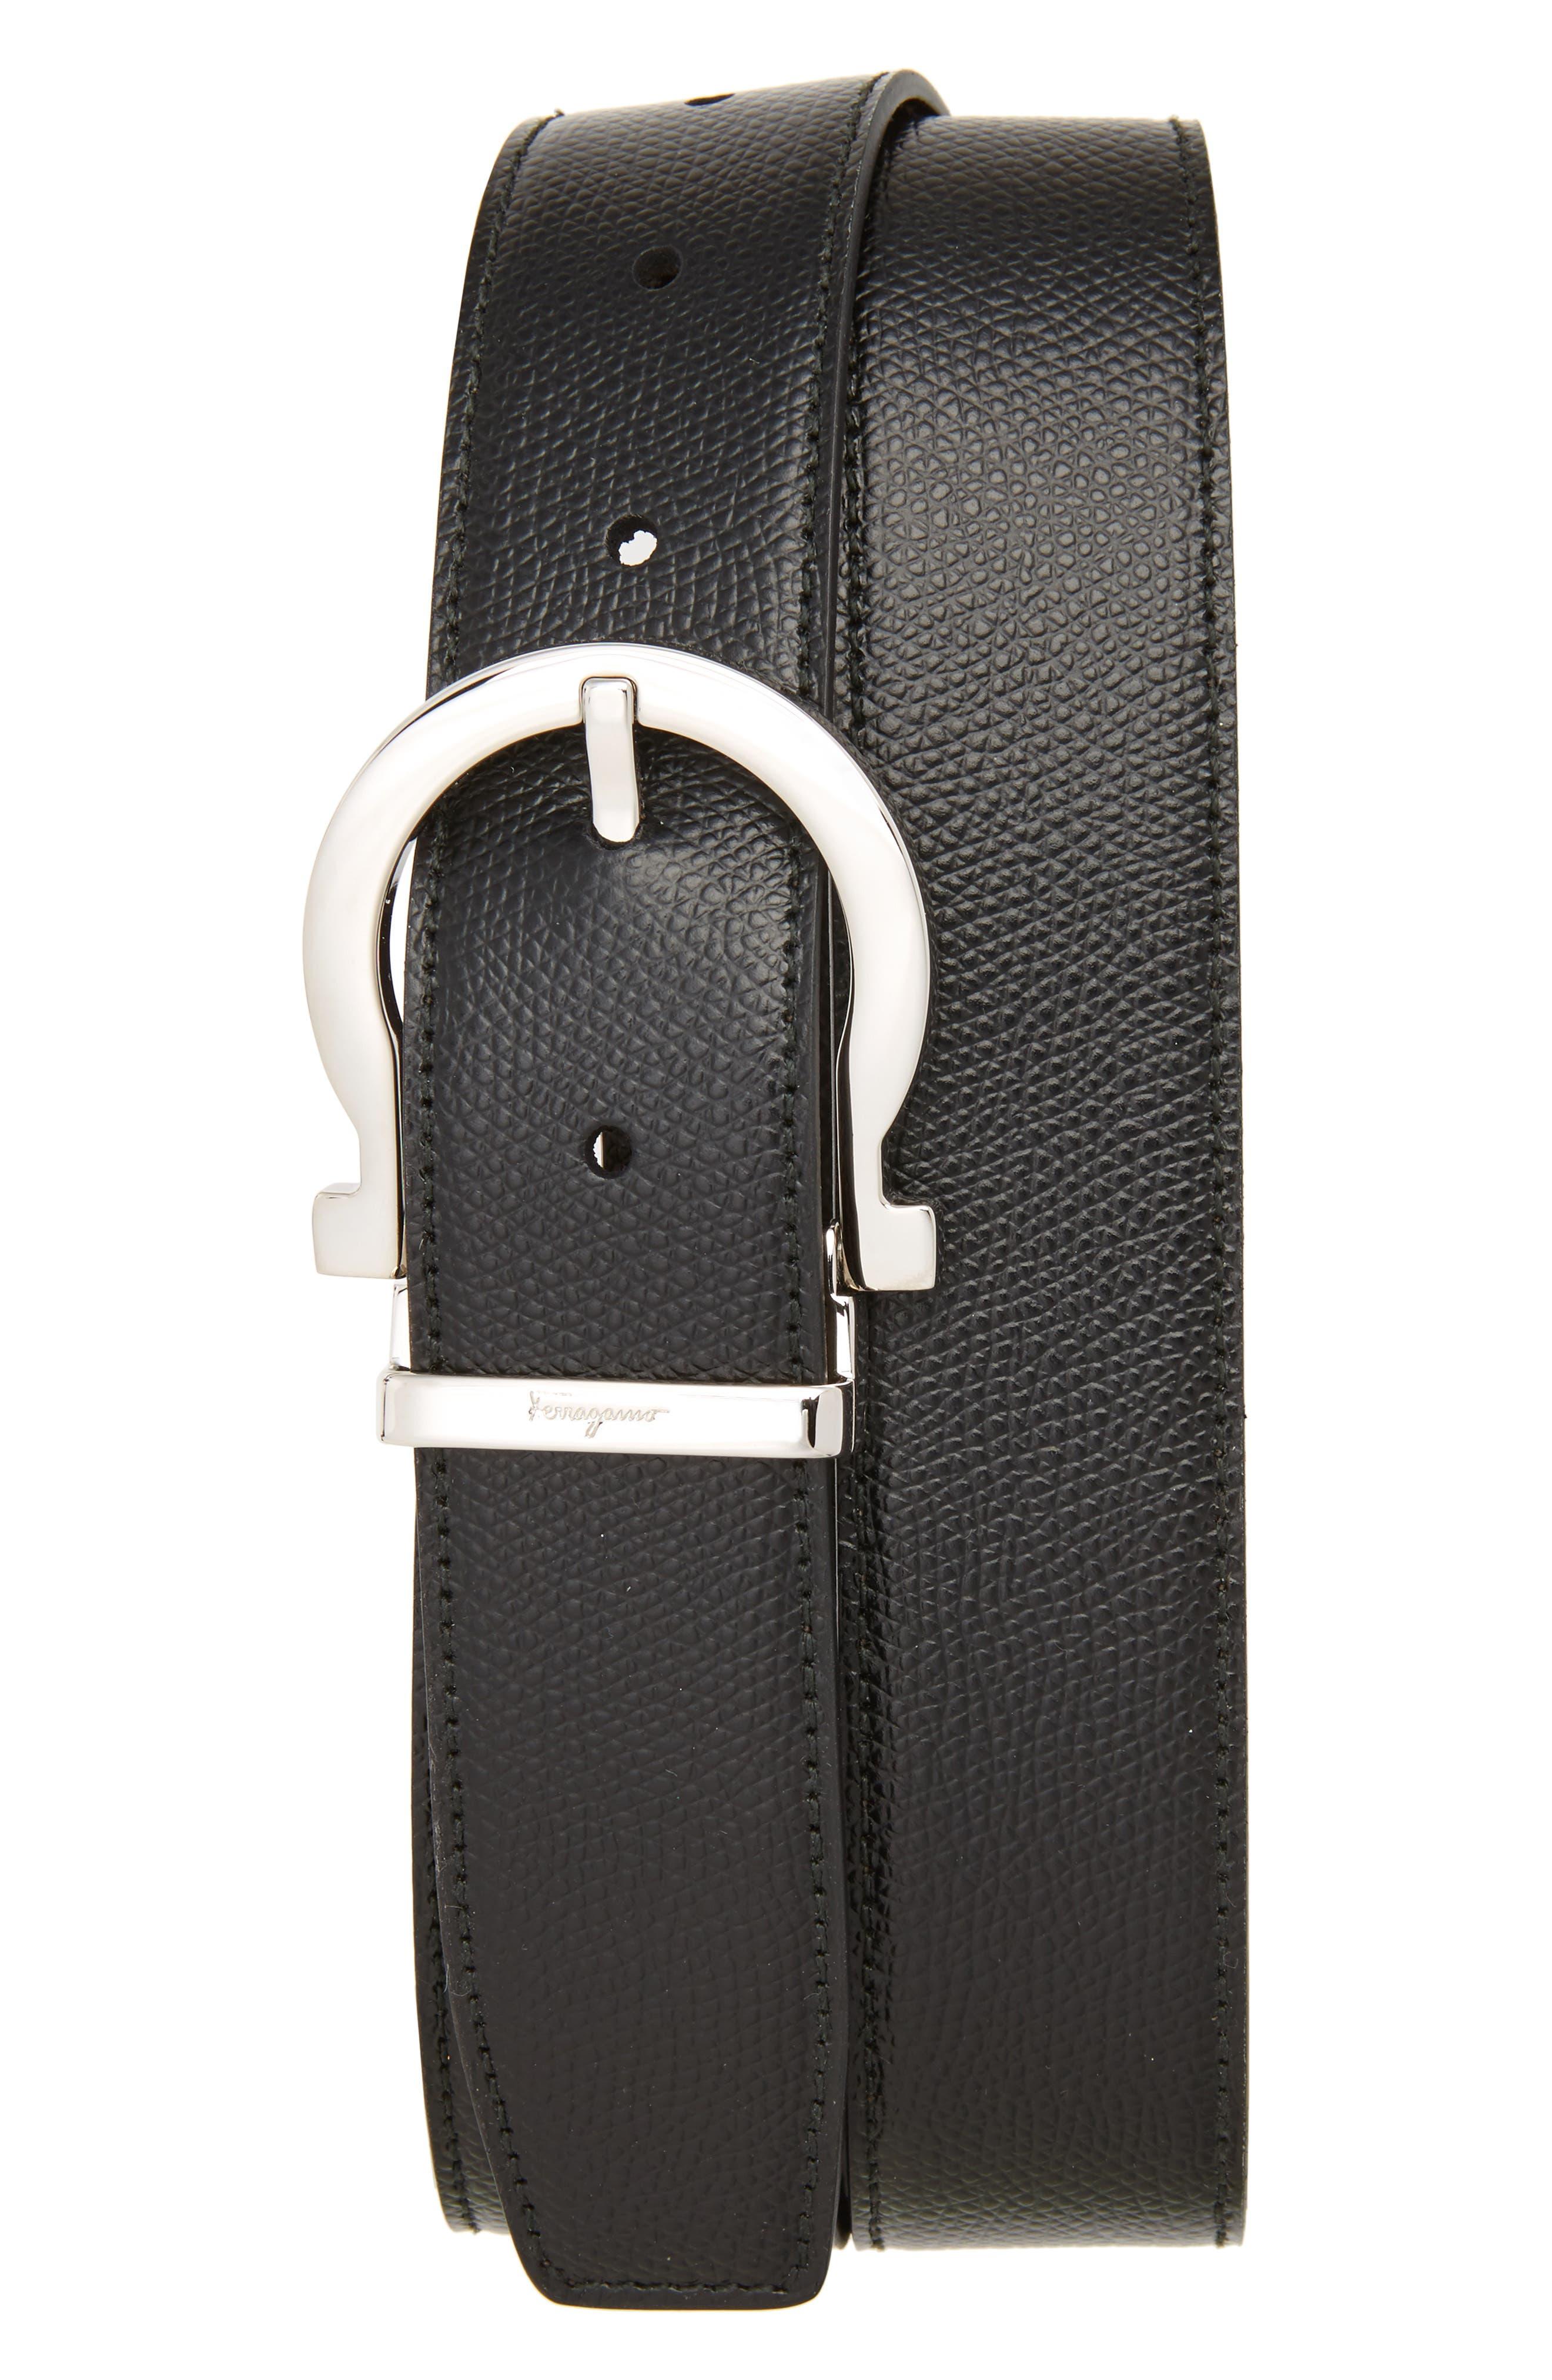 SALVATORE FERRAGAMO Reversible Leather Belt, Main, color, BLACK/ HICKORY